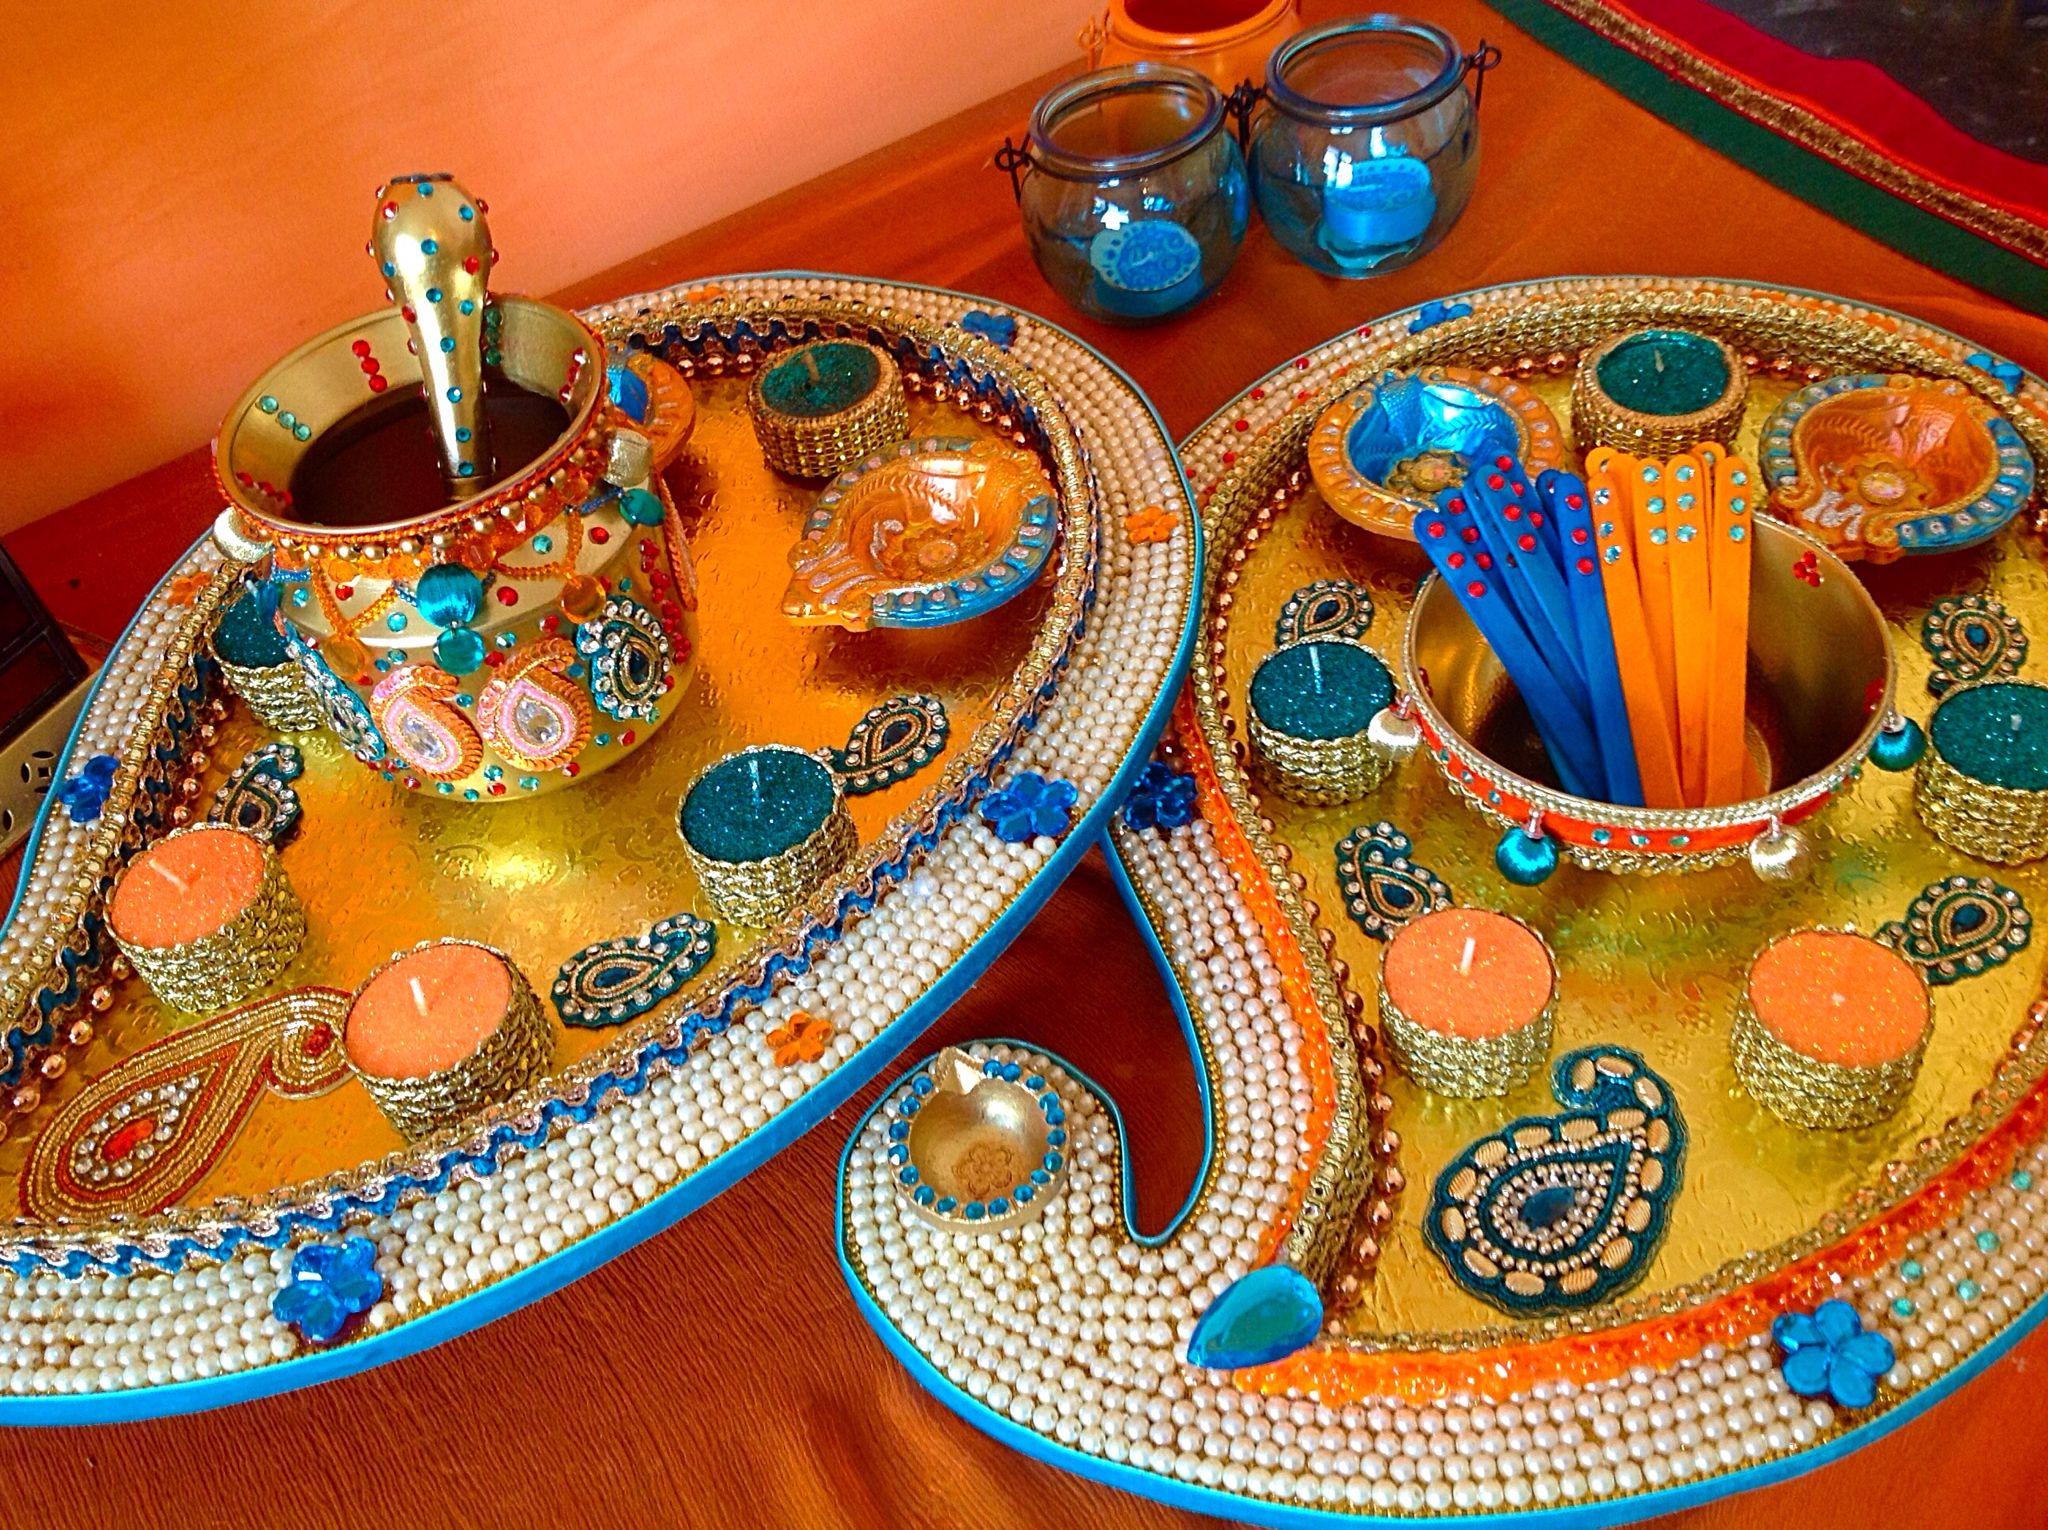 Diy Mehndi Plates : Large paisley shaped mehndi plates these are being used